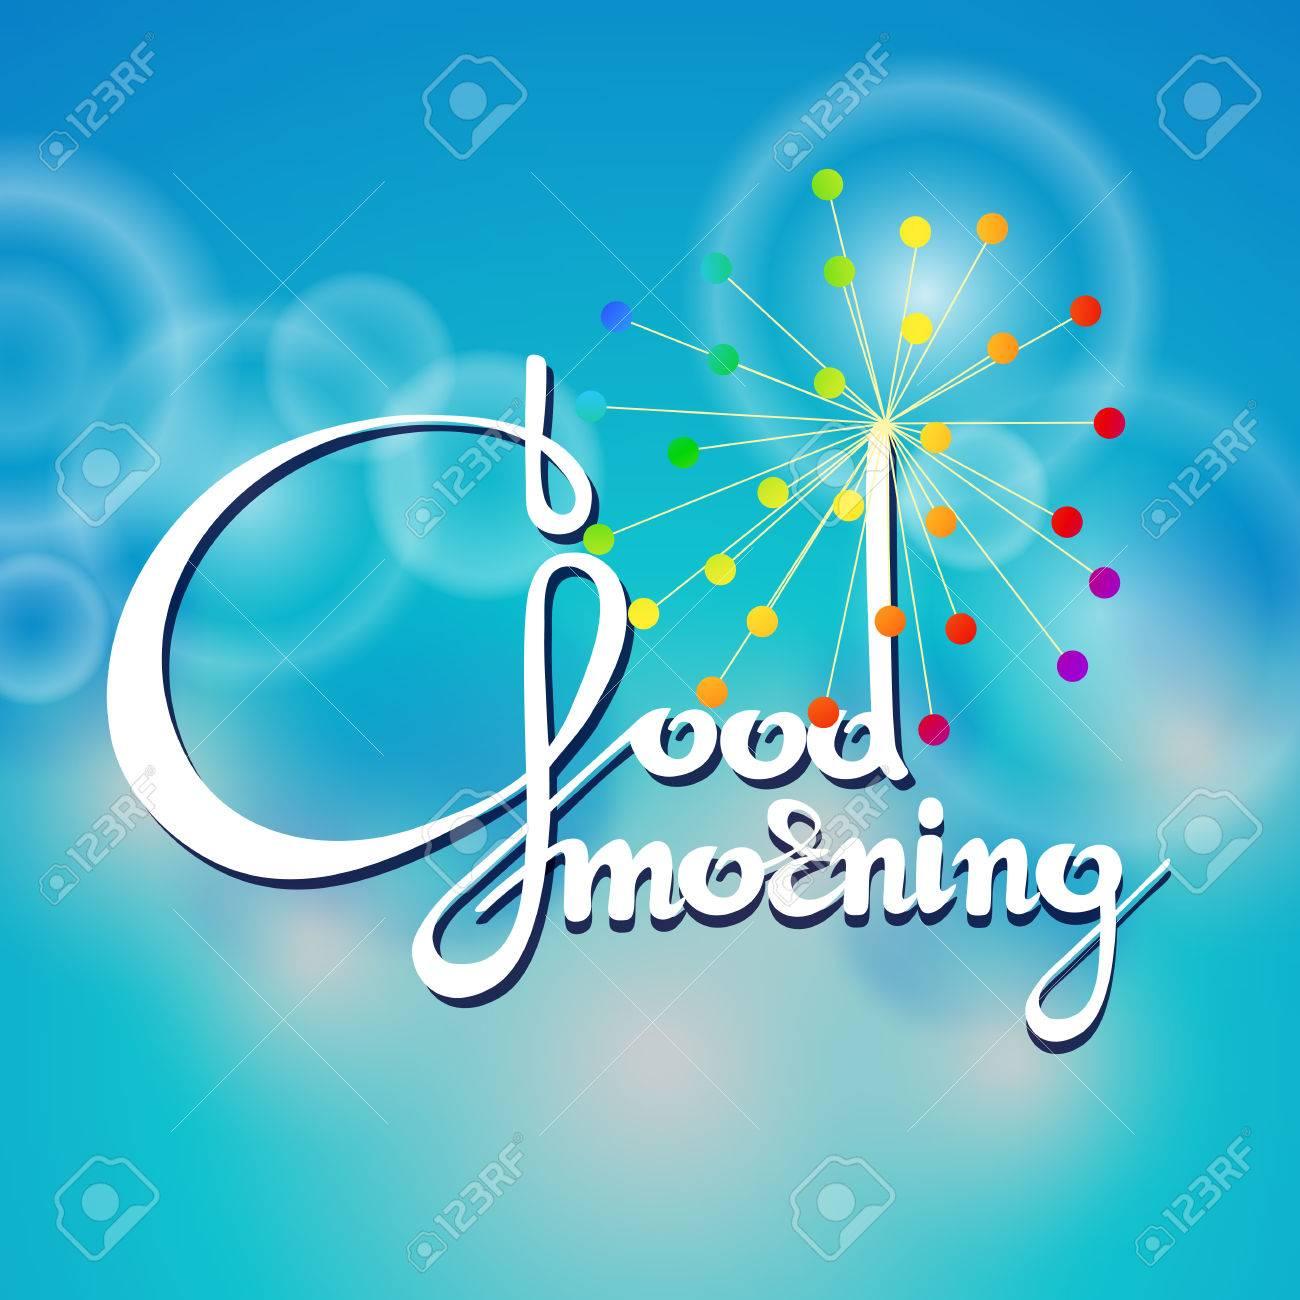 Vector Illustration Of Handwritten Words Good Morning On Blue